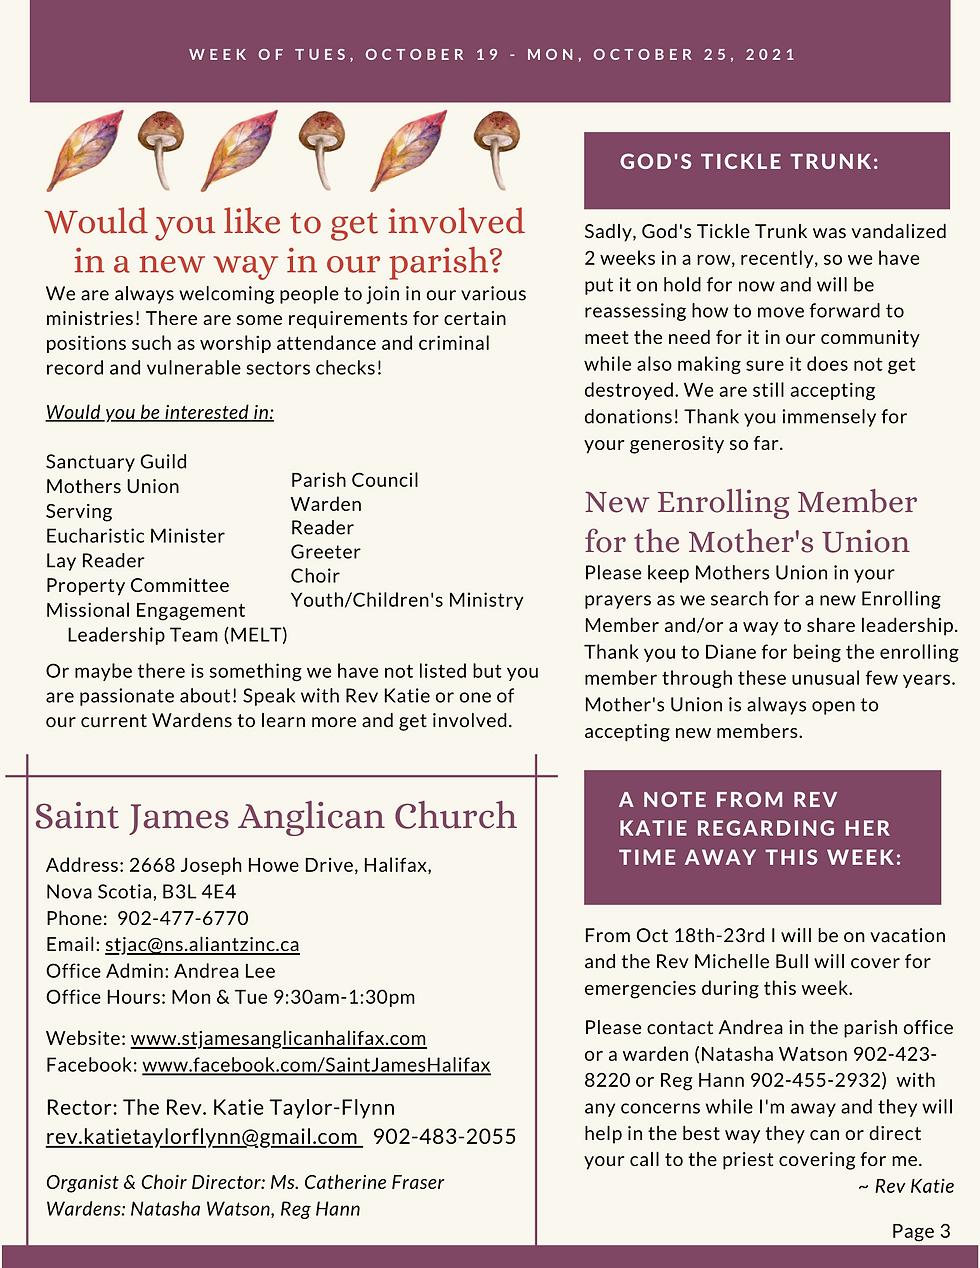 Oct 19-25, 2021 St J Newsletter p3.png